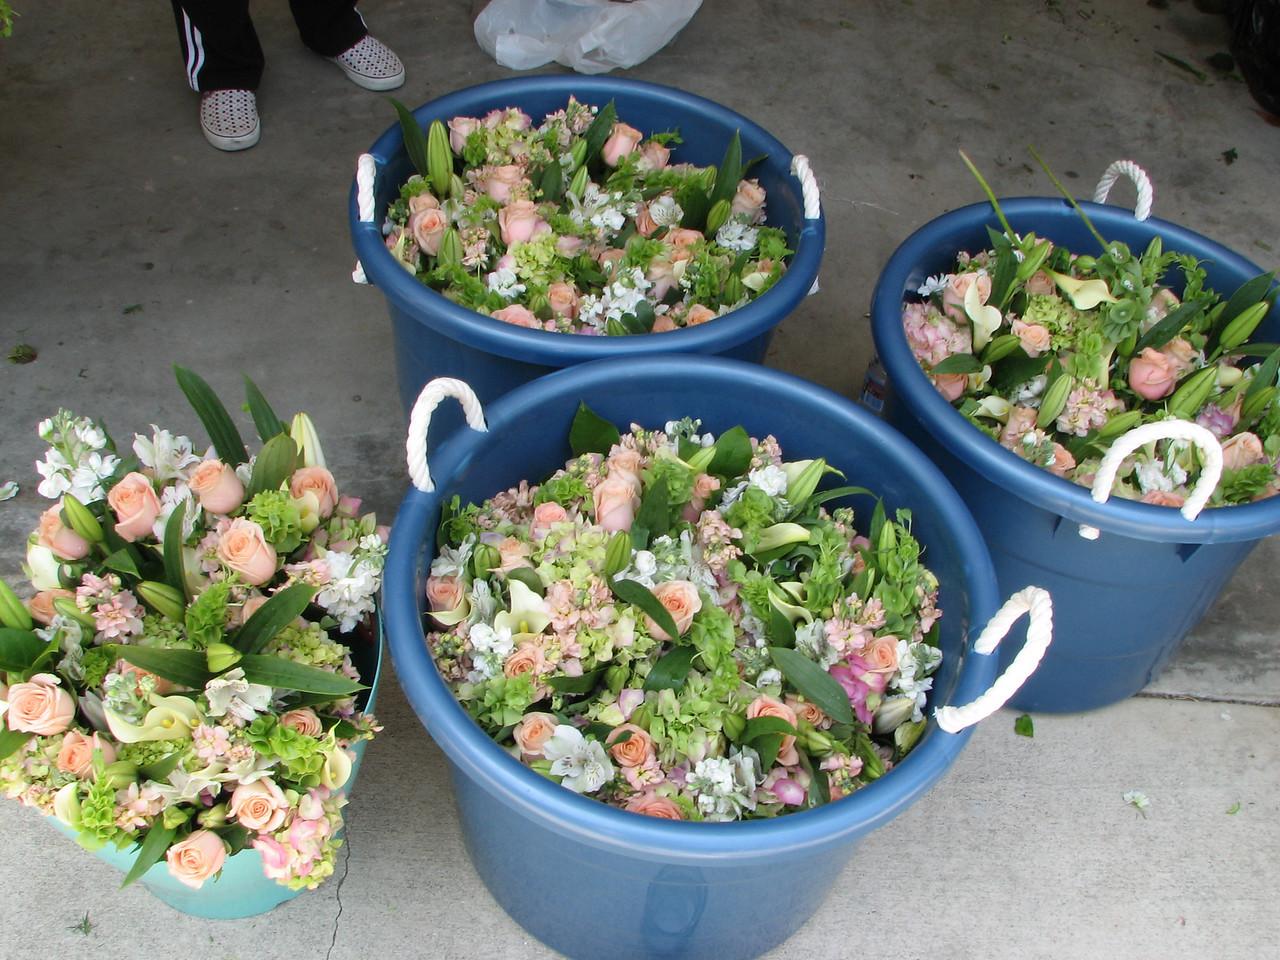 2007 06 09 Sat - Pew bouquets awaiting prep